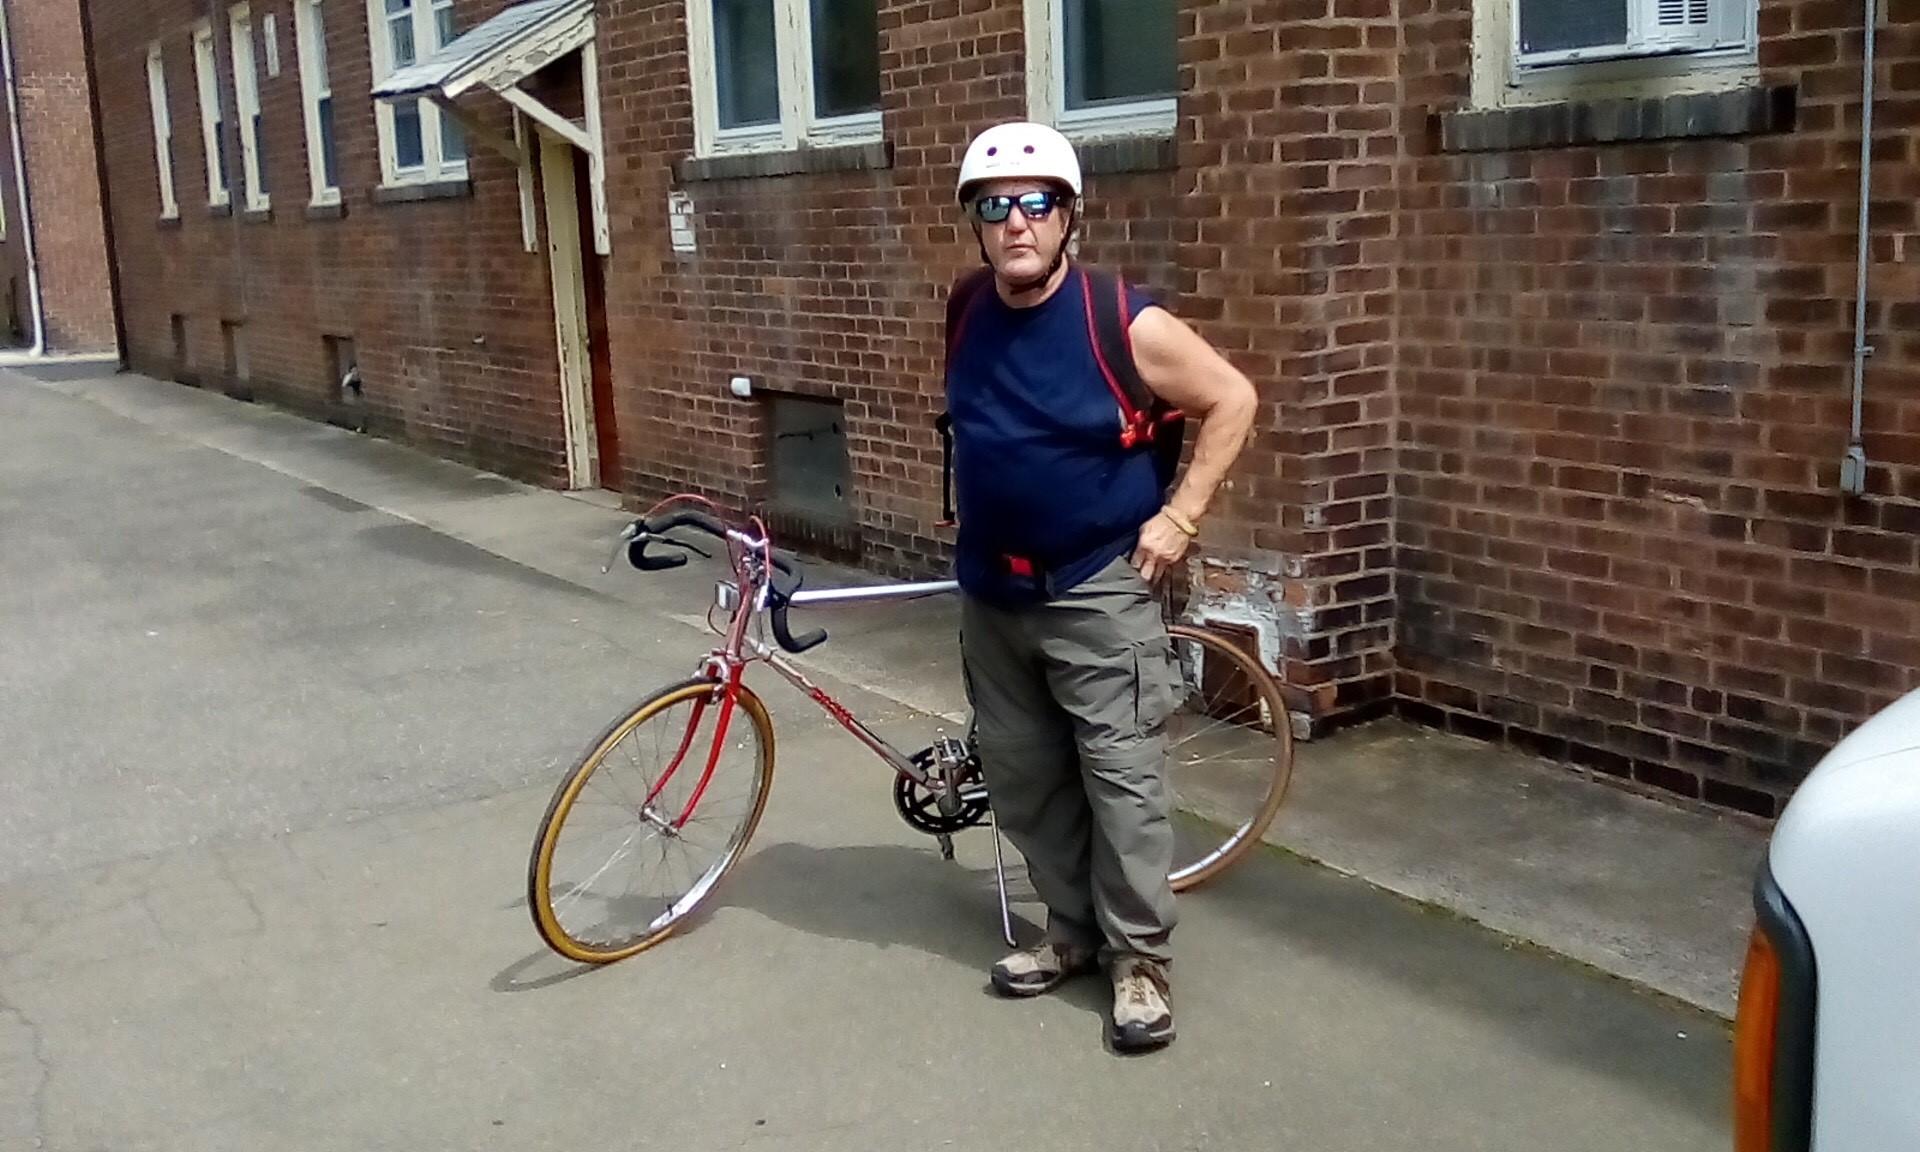 Photo: Bikes for Vets Program